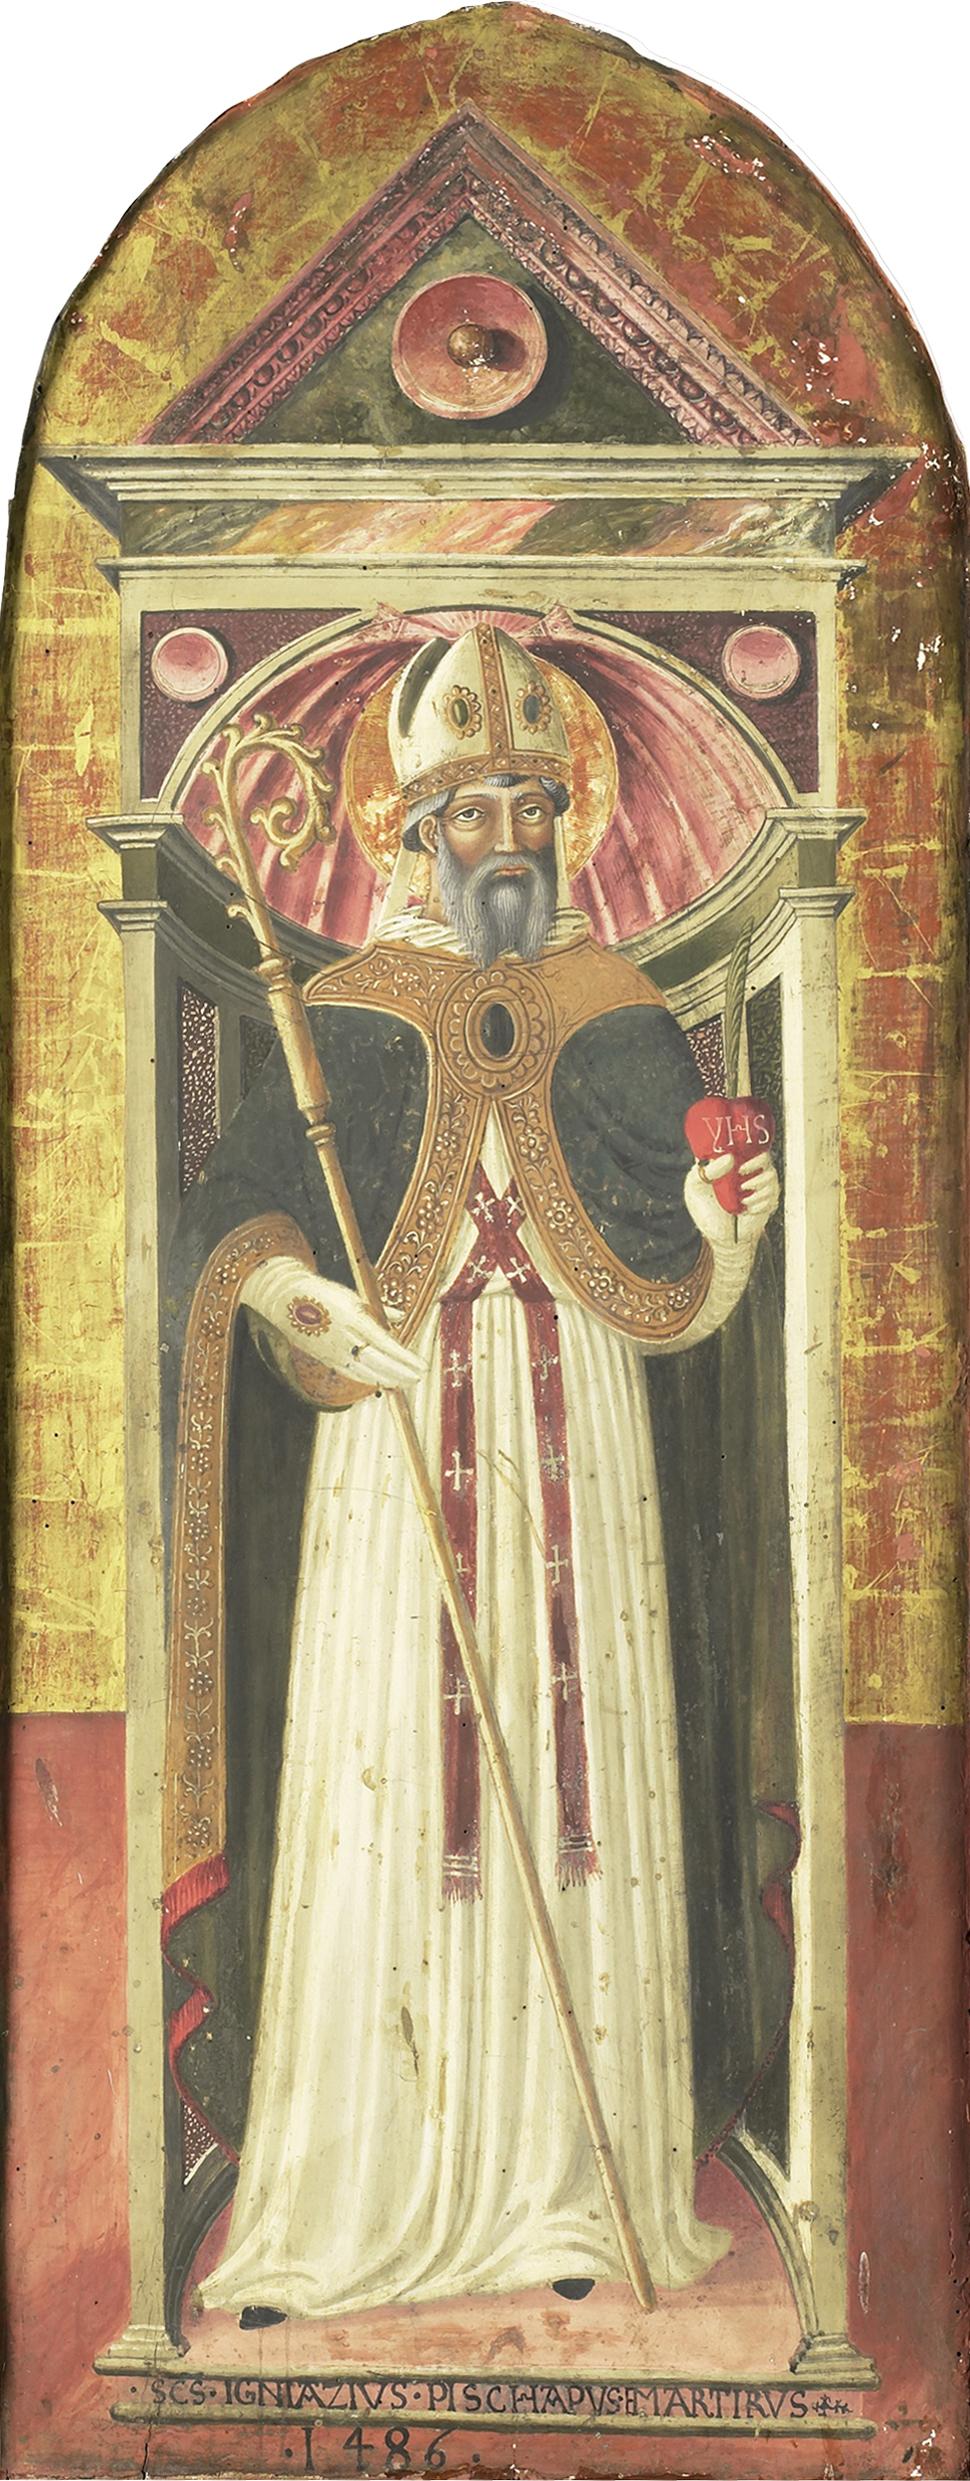 https://upload.wikimedia.org/wikipedia/commons/a/a3/Anoniem_-_De_heilige_Ignatius_van_Antiochi%C3%AB.jpg